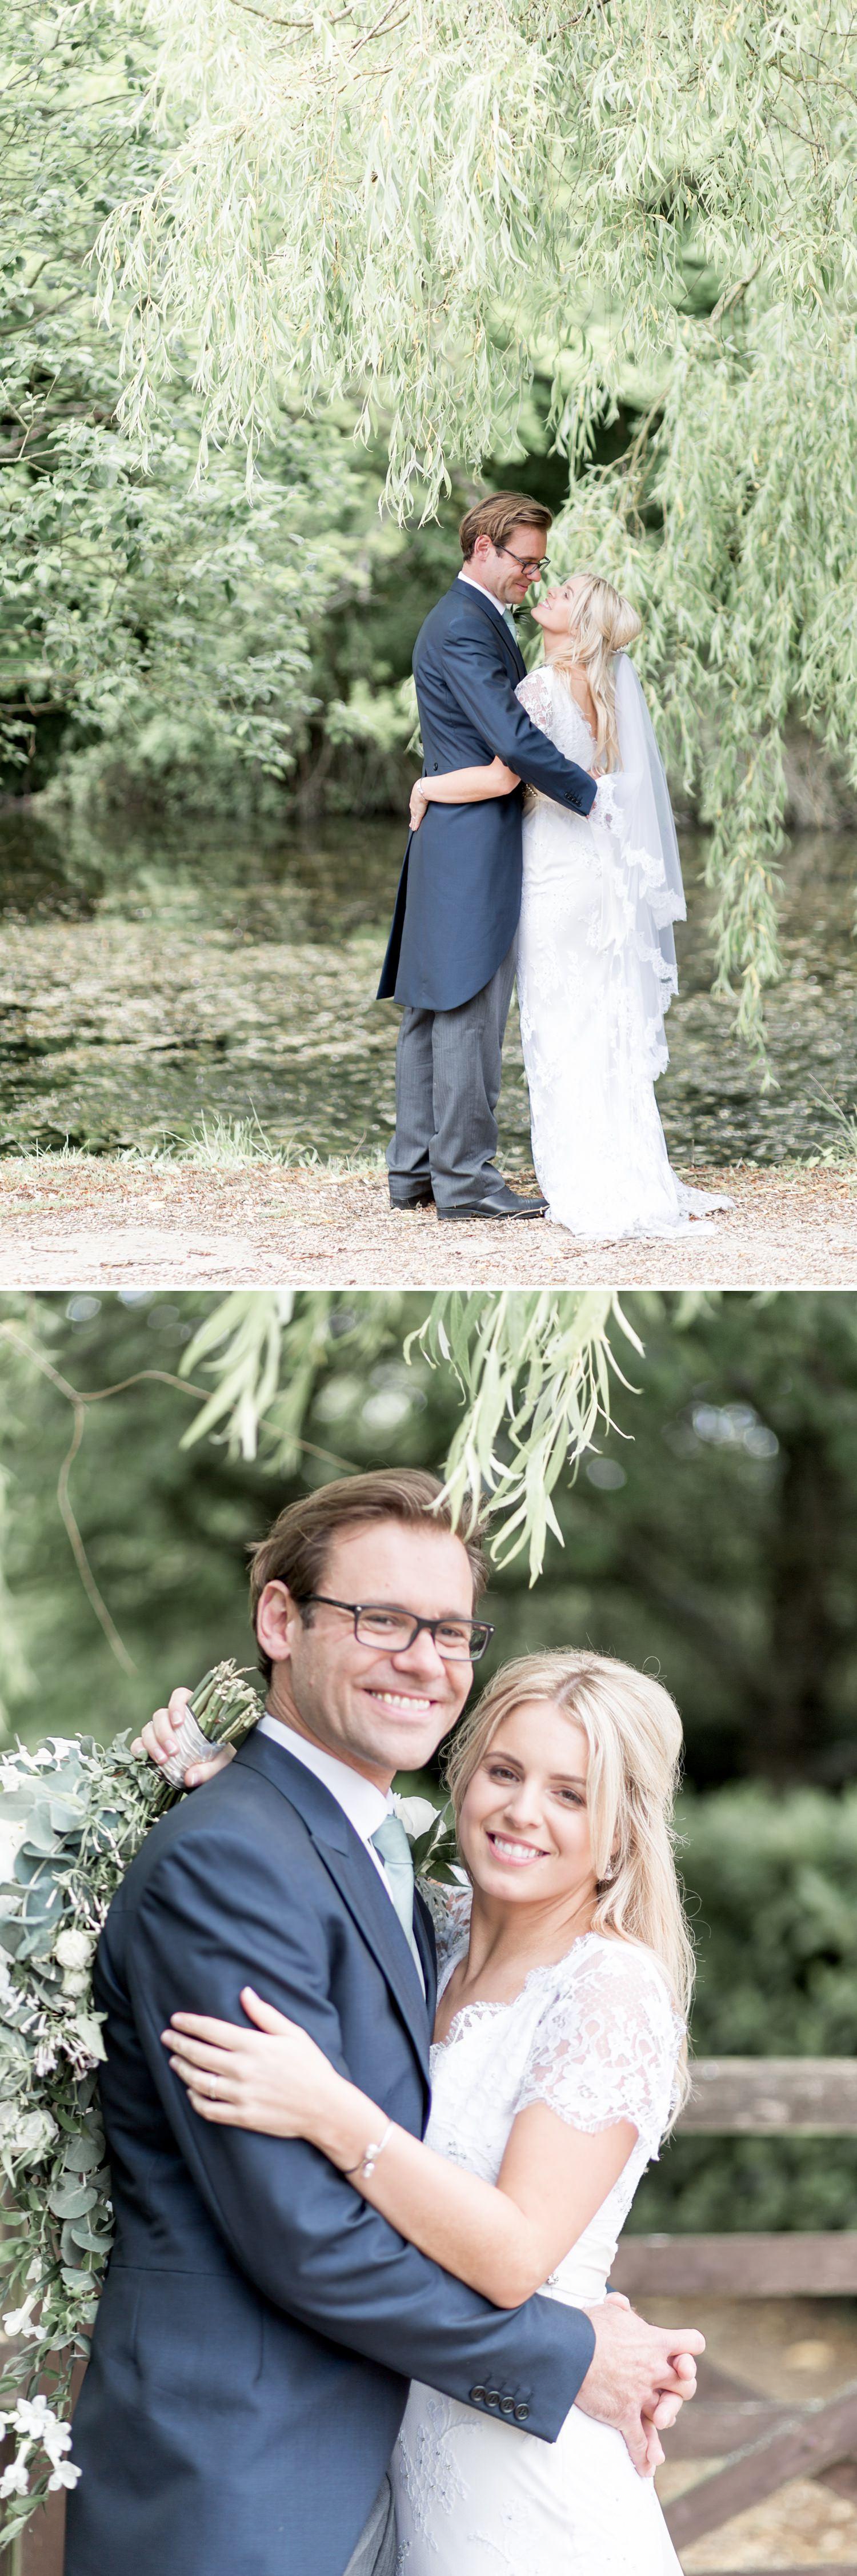 Emily & Jonathan's Cambridgeshire wedding - couple posing under weeping willow